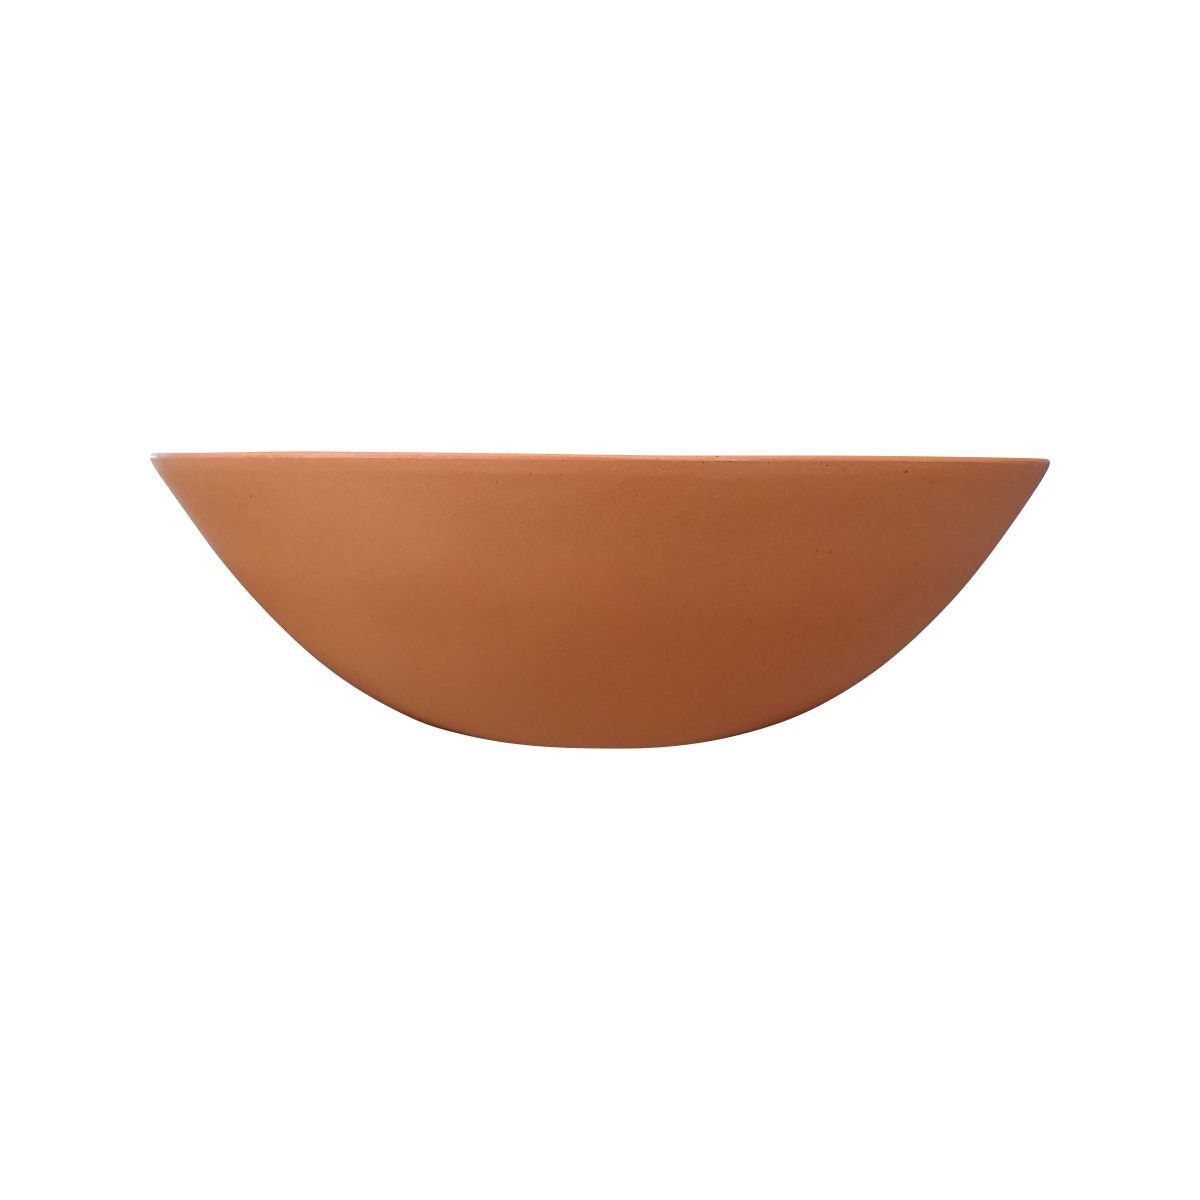 Vaso Bacia Pequeno cor Terracota 12cm x 35cm - 6705